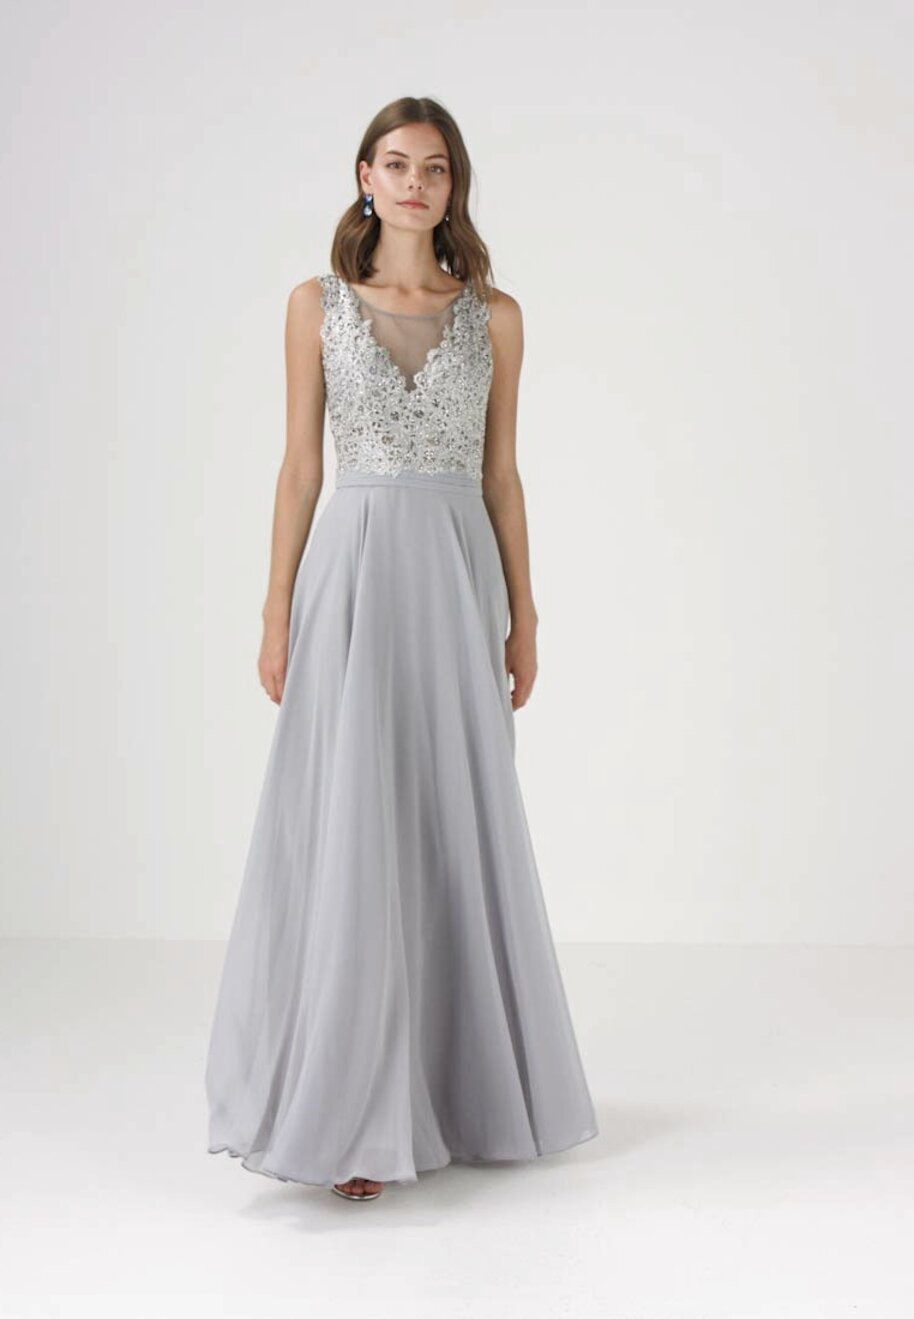 17 Großartig Luxuar Limited Abendkleid ÄrmelAbend Einfach Luxuar Limited Abendkleid Vertrieb